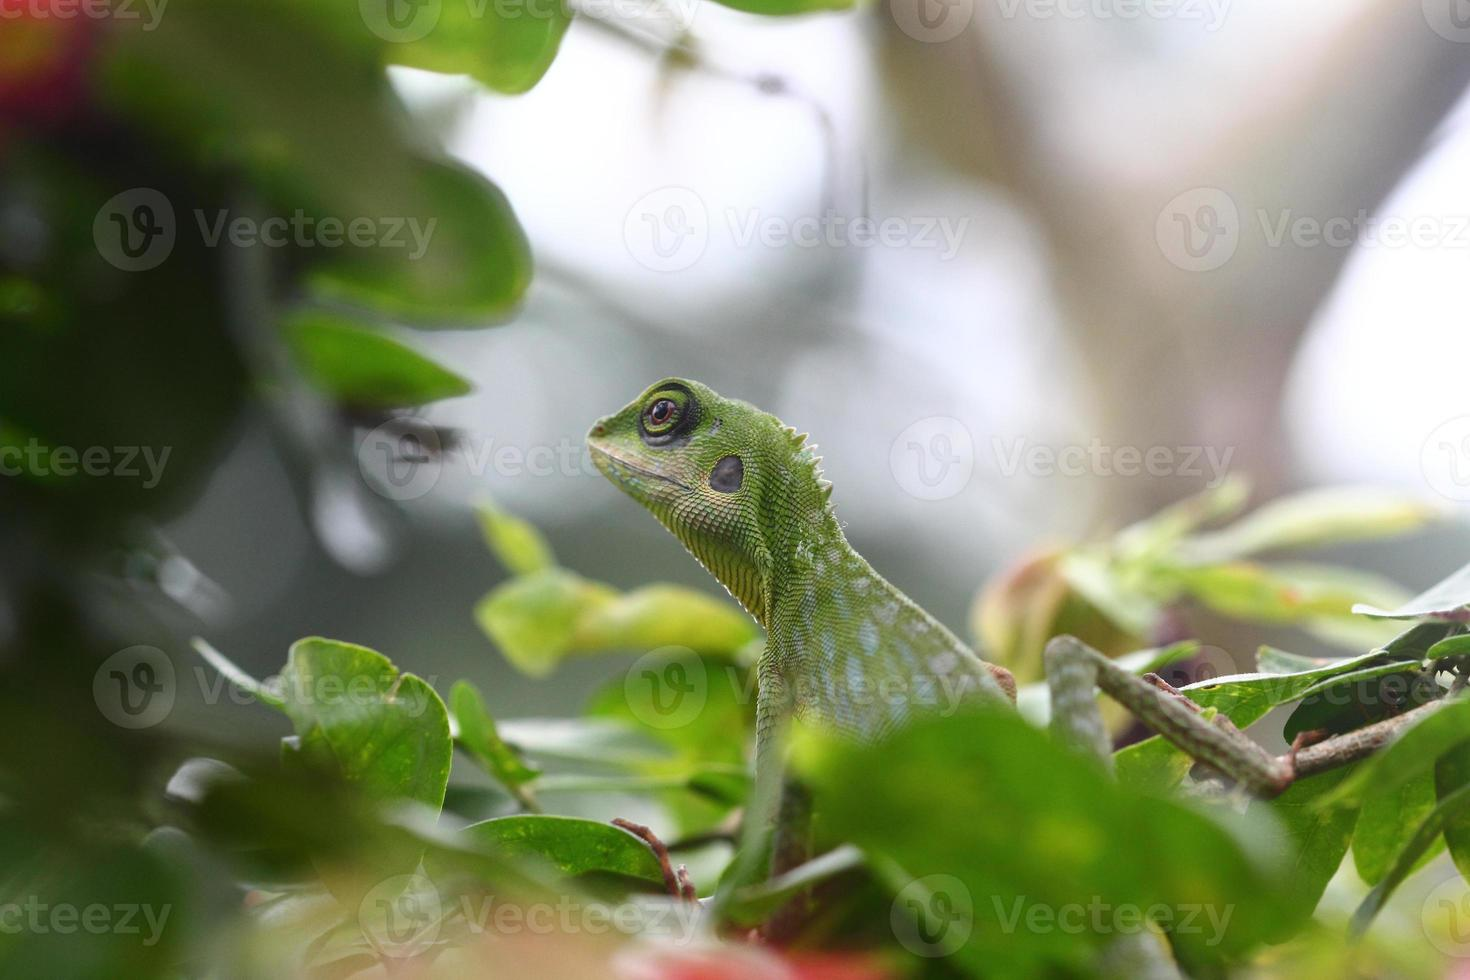 lagarto crestado verde buscando comida foto